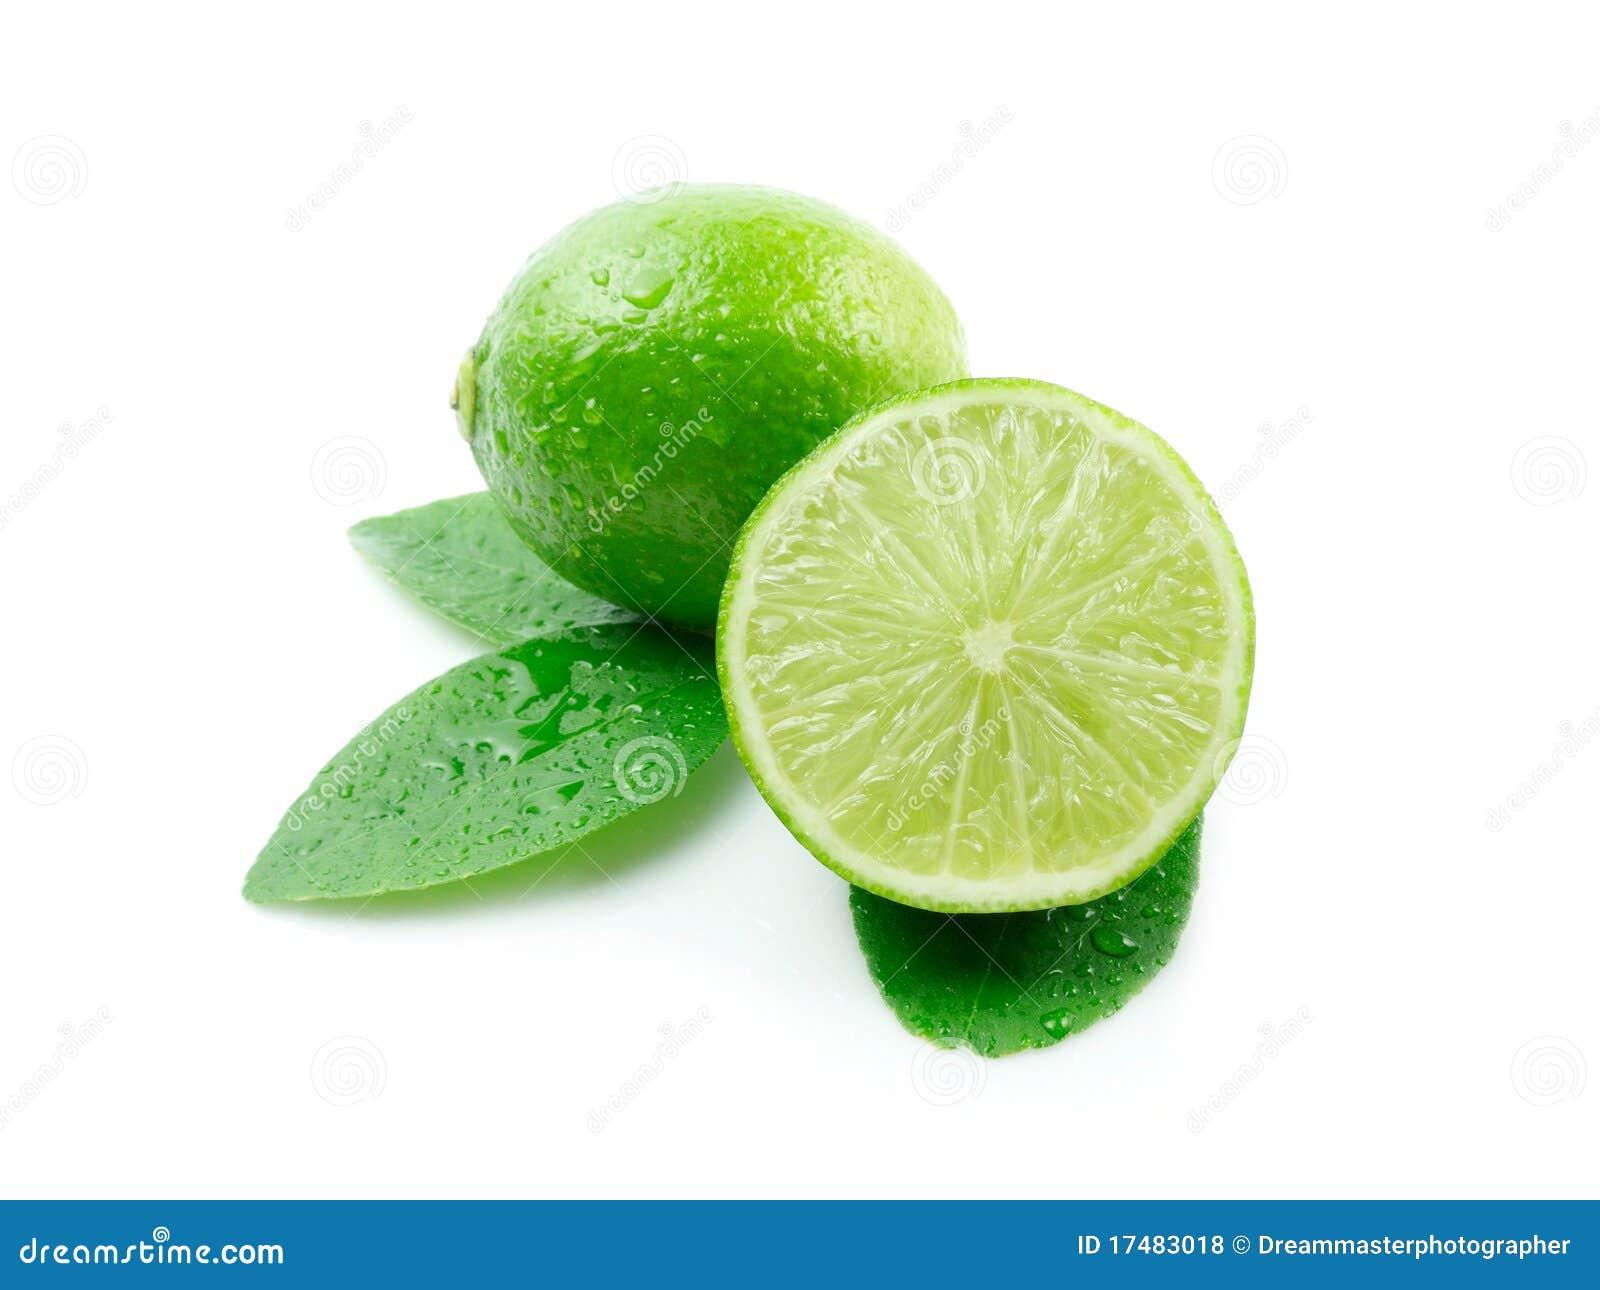 Green lemons with leaves